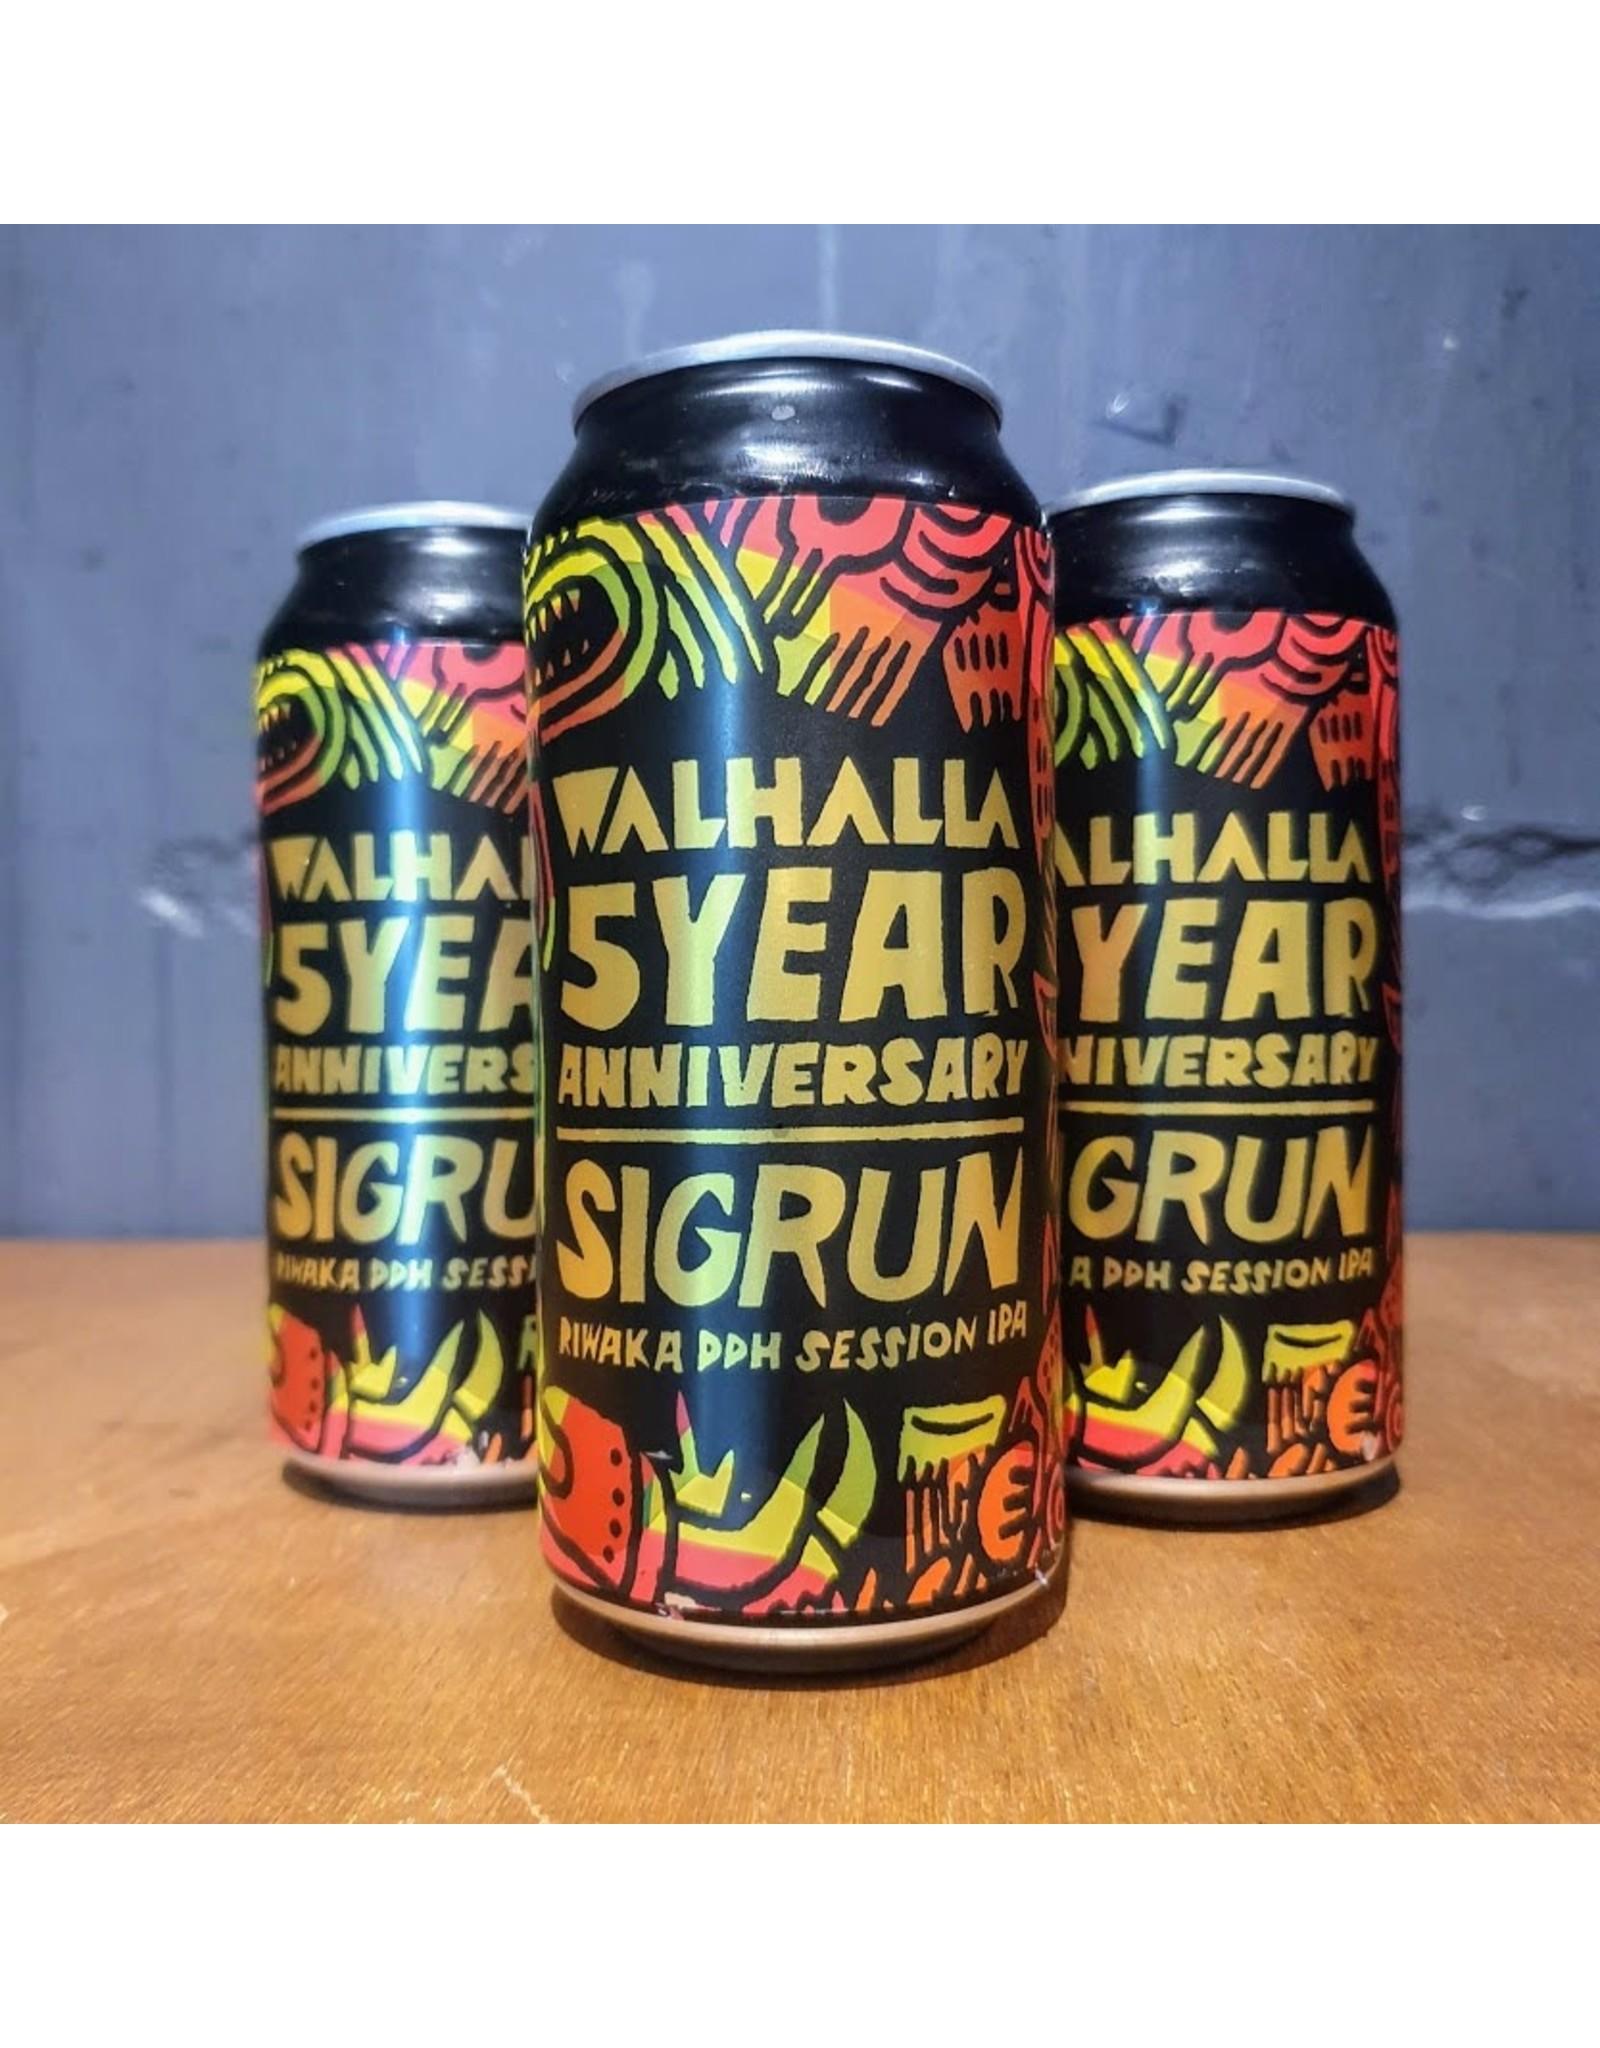 Walhalla Walhalla: Sigrun (5 Year Anniversary)